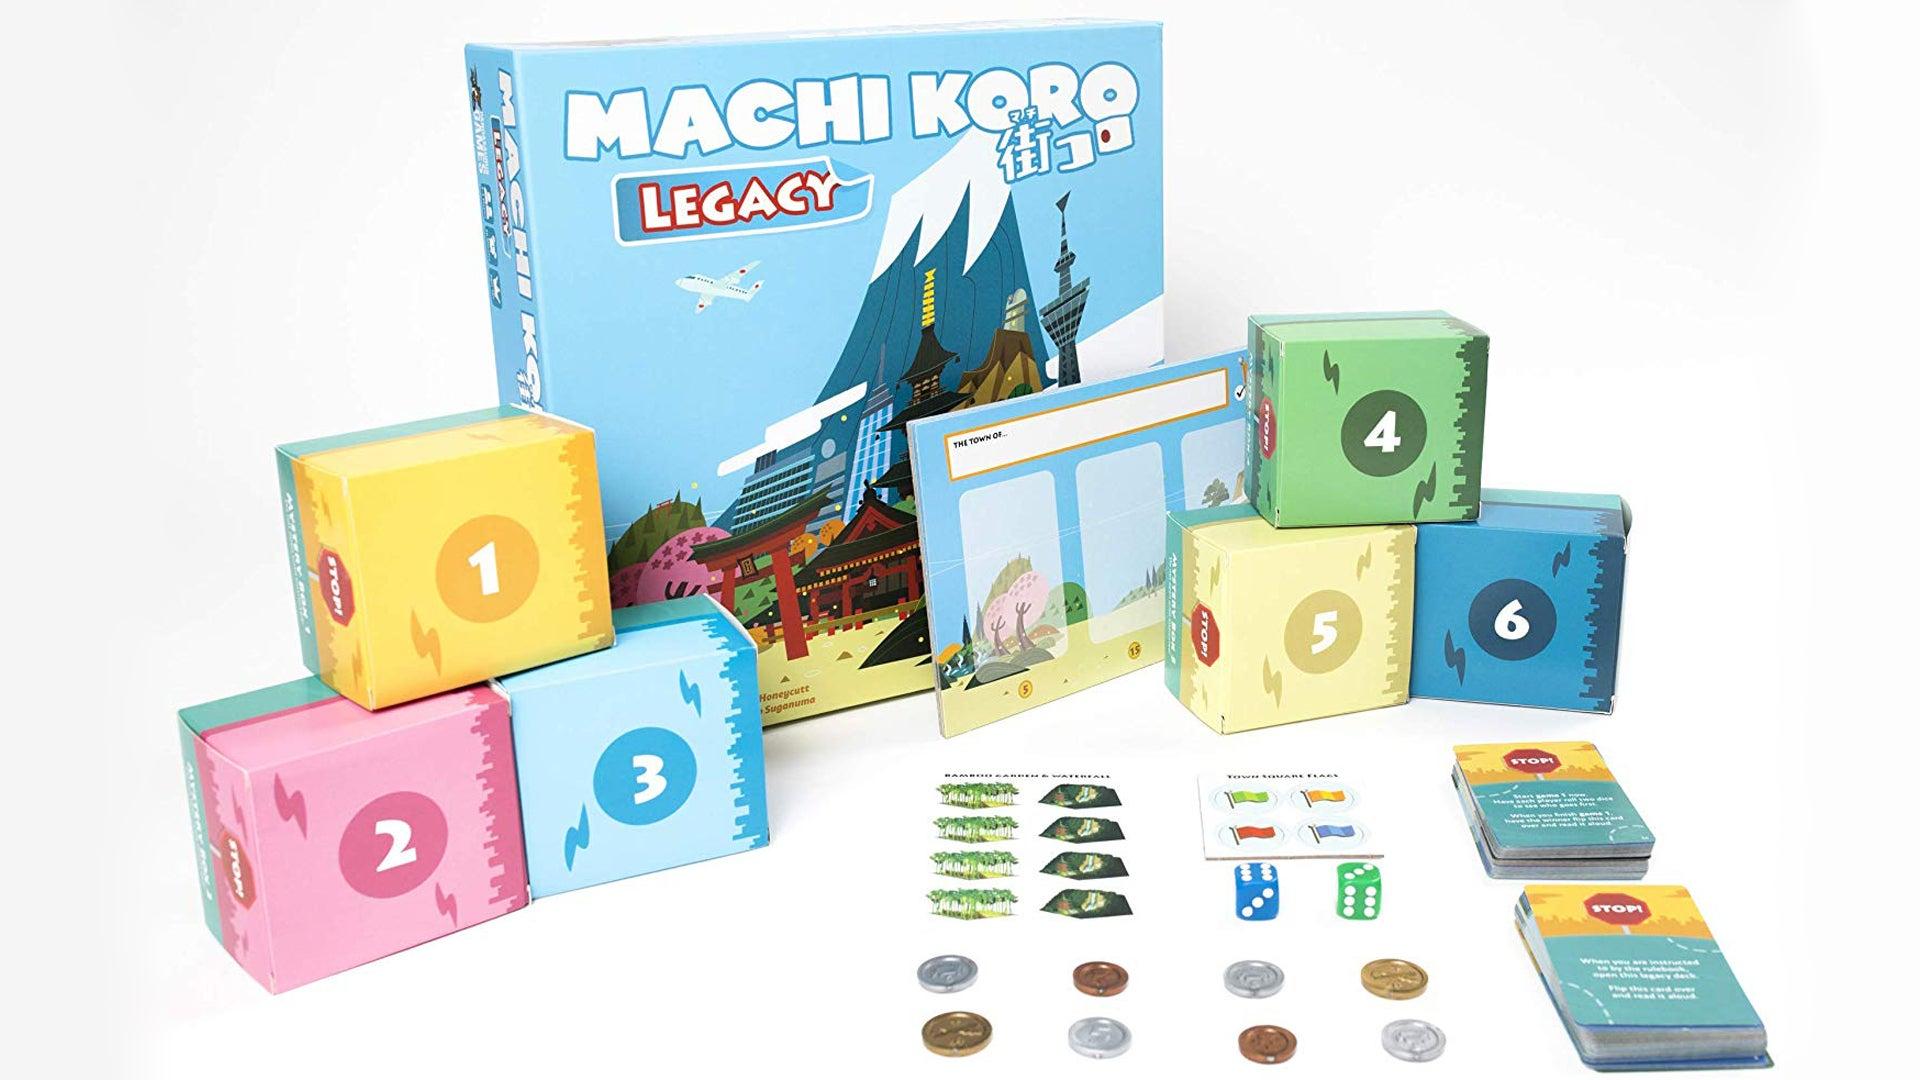 Machi Koro Legacy board game box and components